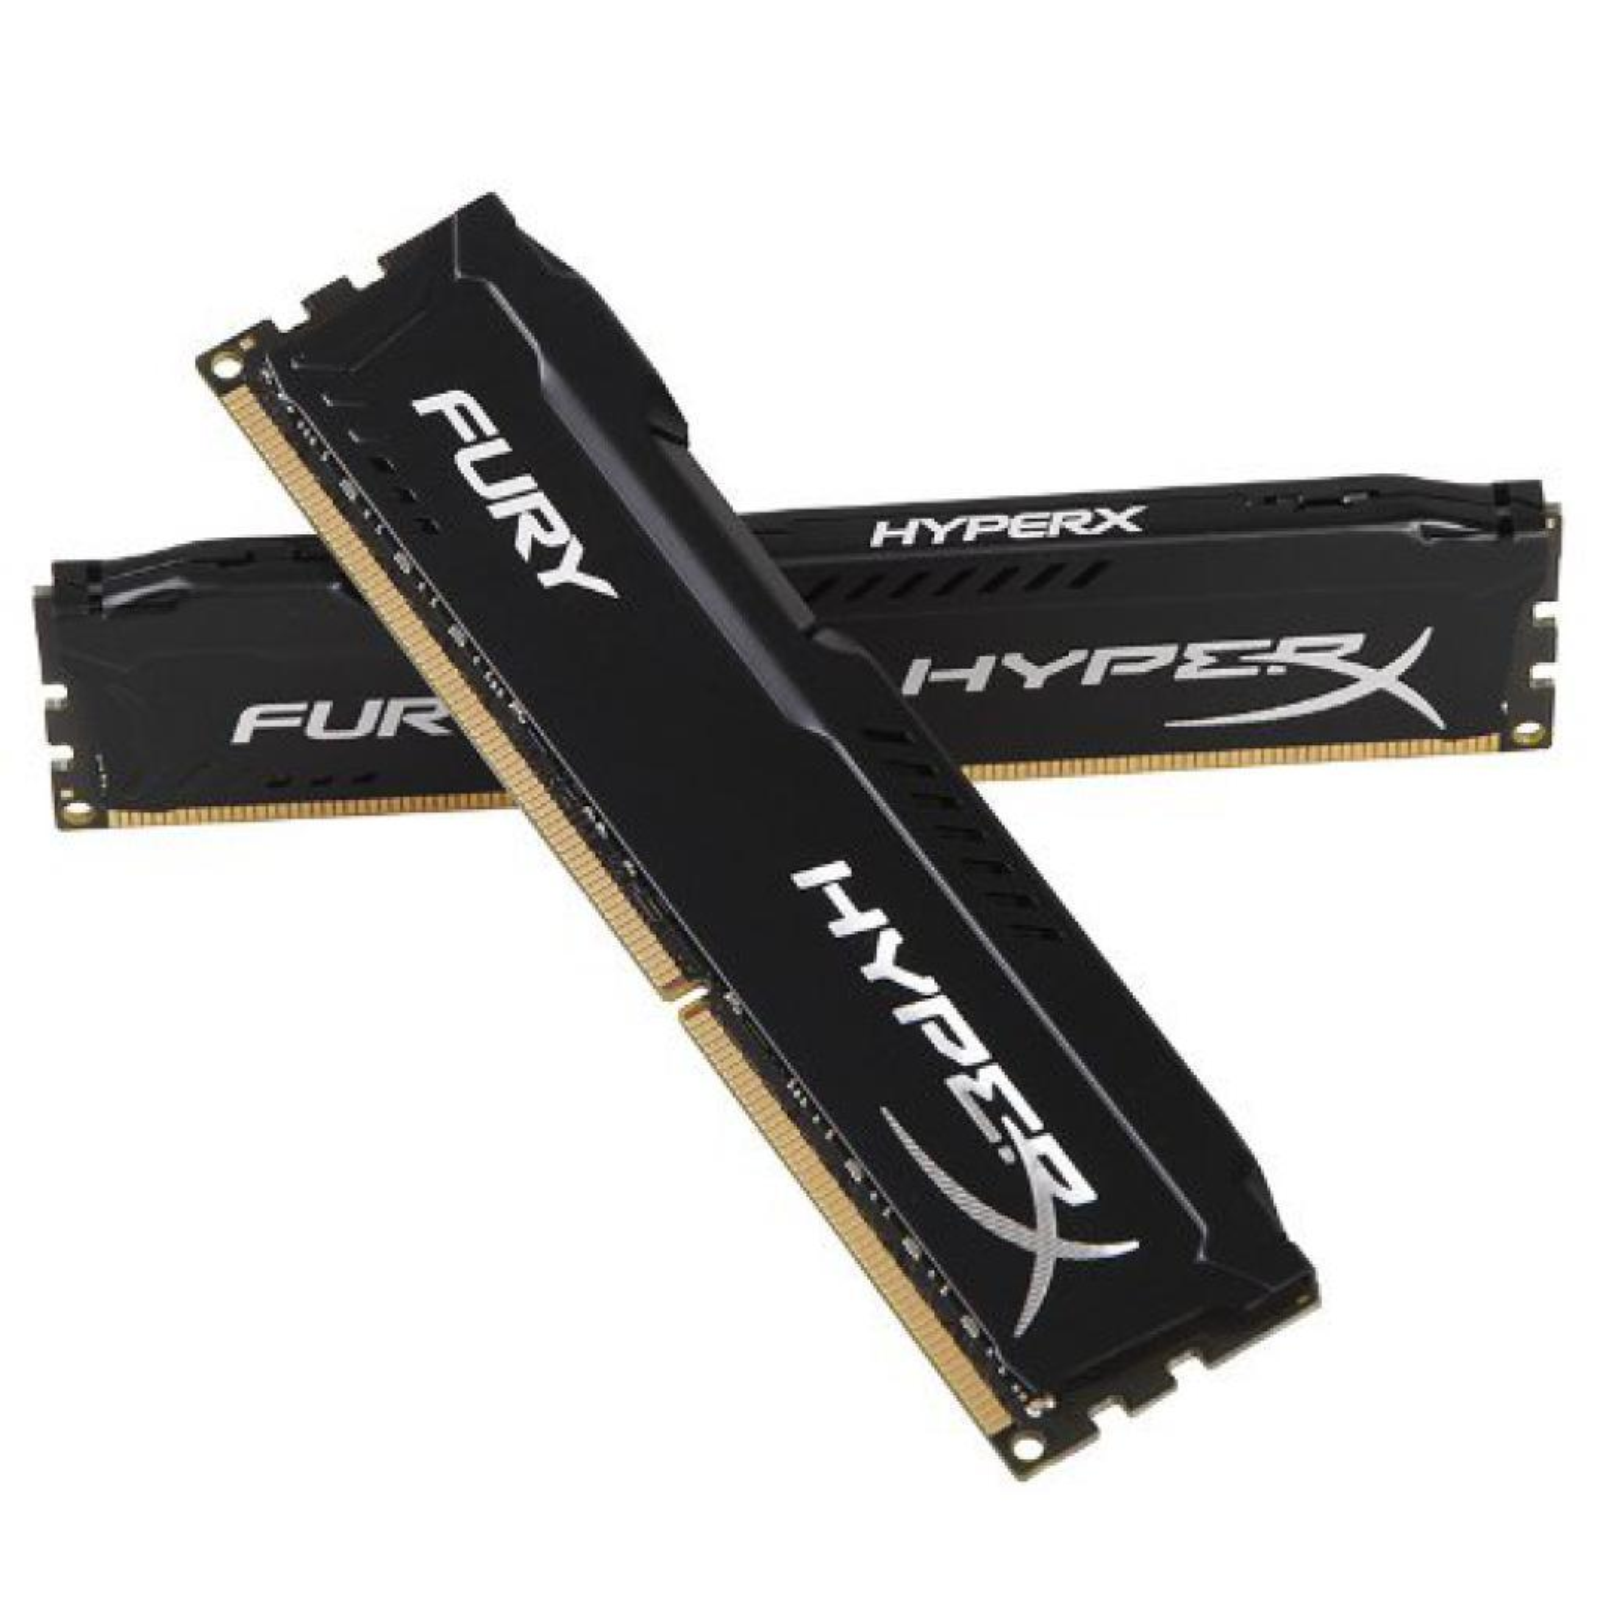 Модуль памяти для компьютера DDR4 32GB (2x16GB) 3200 MHz HyperX FURY Black HyperX (Kingston Fury) (HX432C18FBK2/32) изображение 3